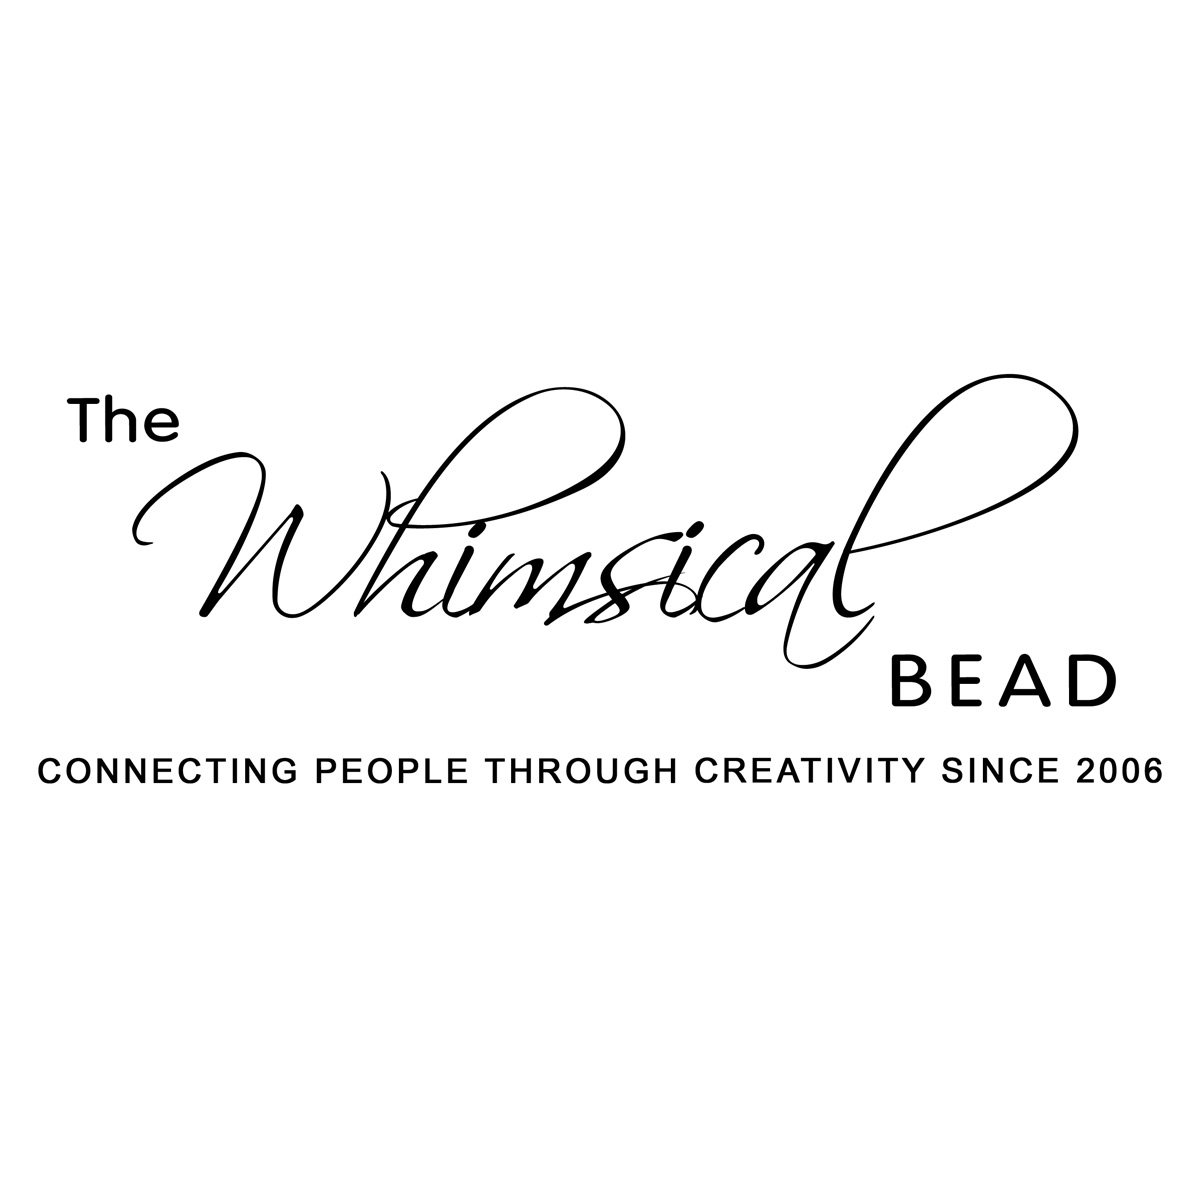 The Whimsical Bead Logo